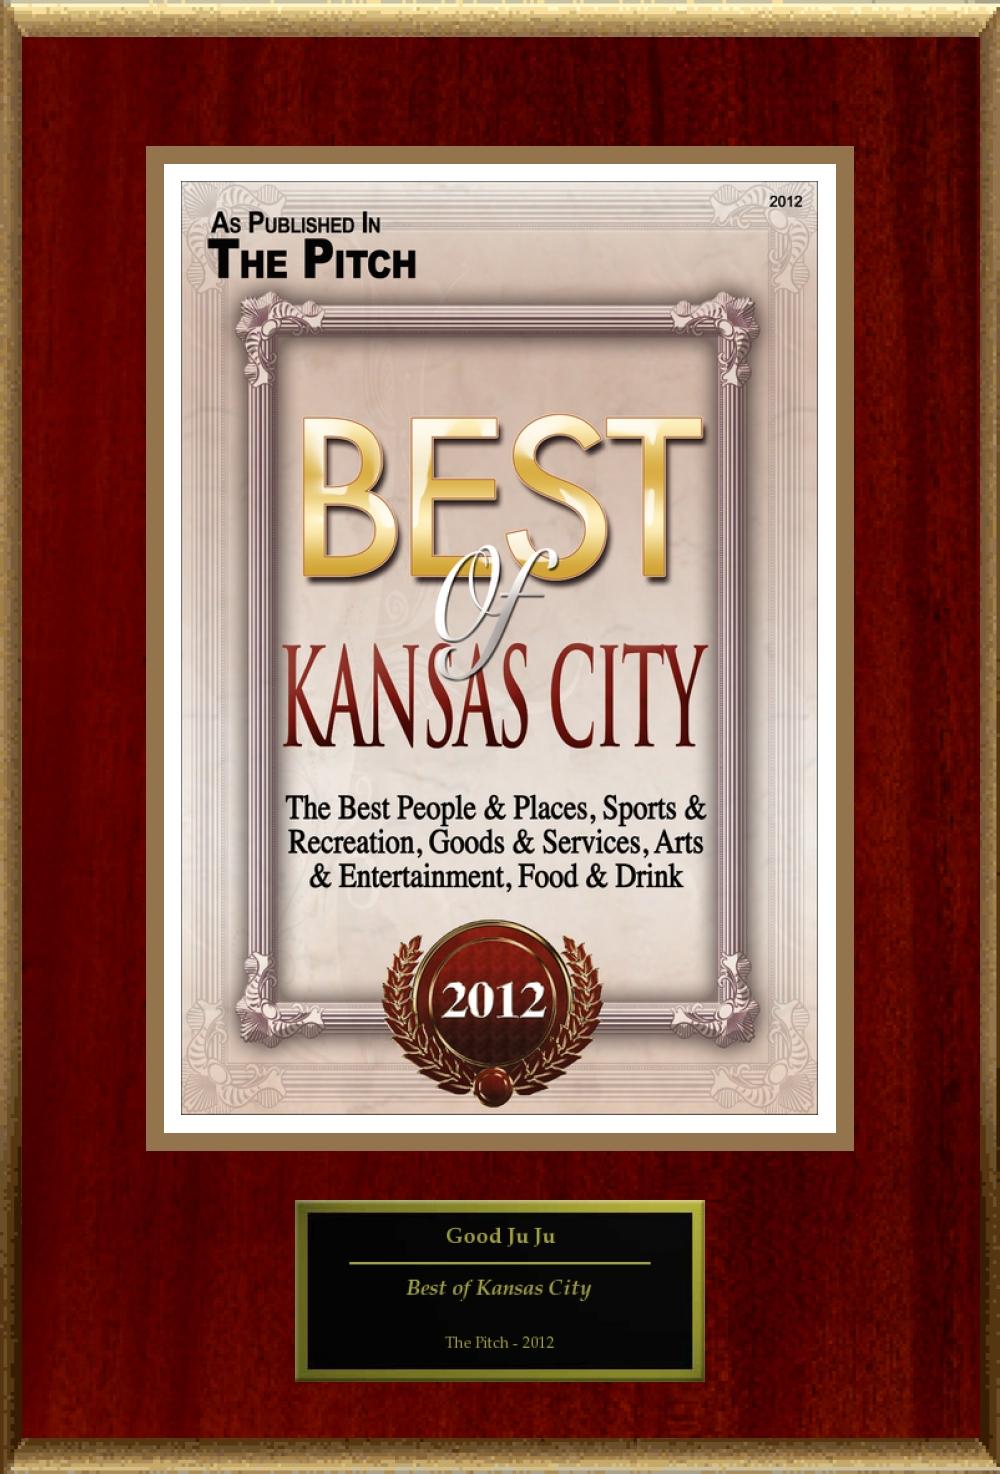 The Pitch Magazine City's Best Award 2012